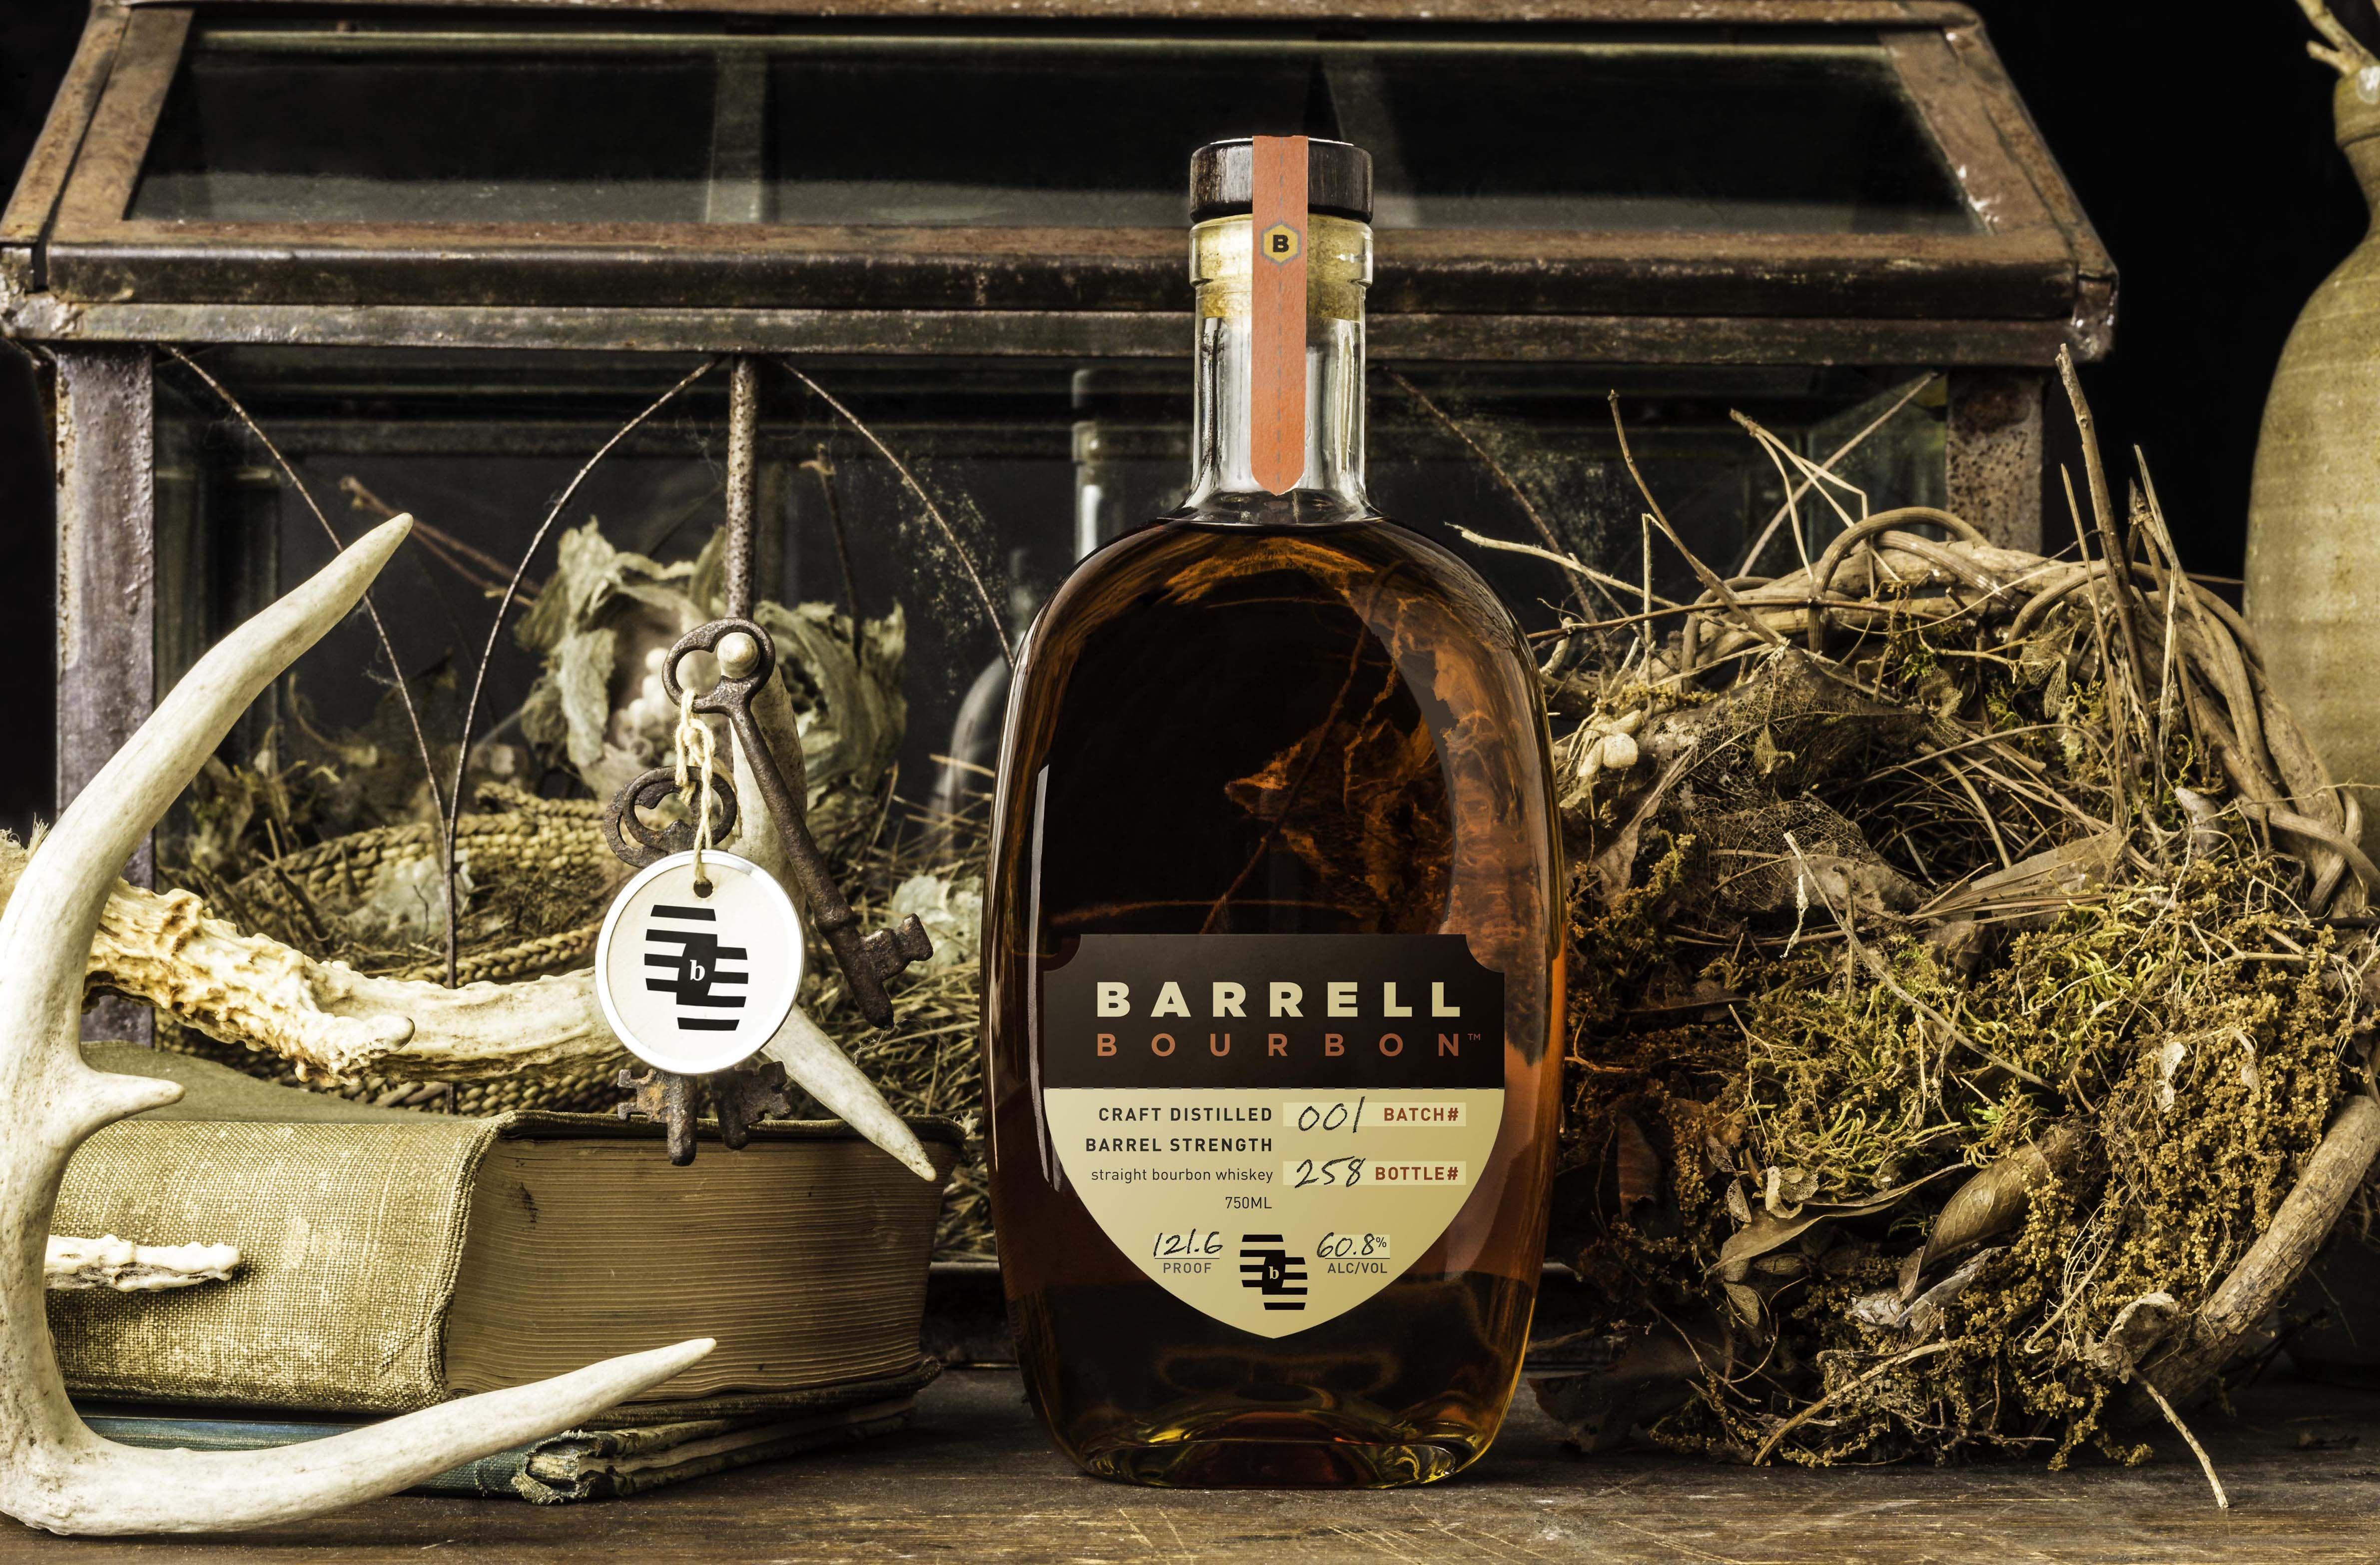 22+ Barrell craft spirits rum ideas in 2021